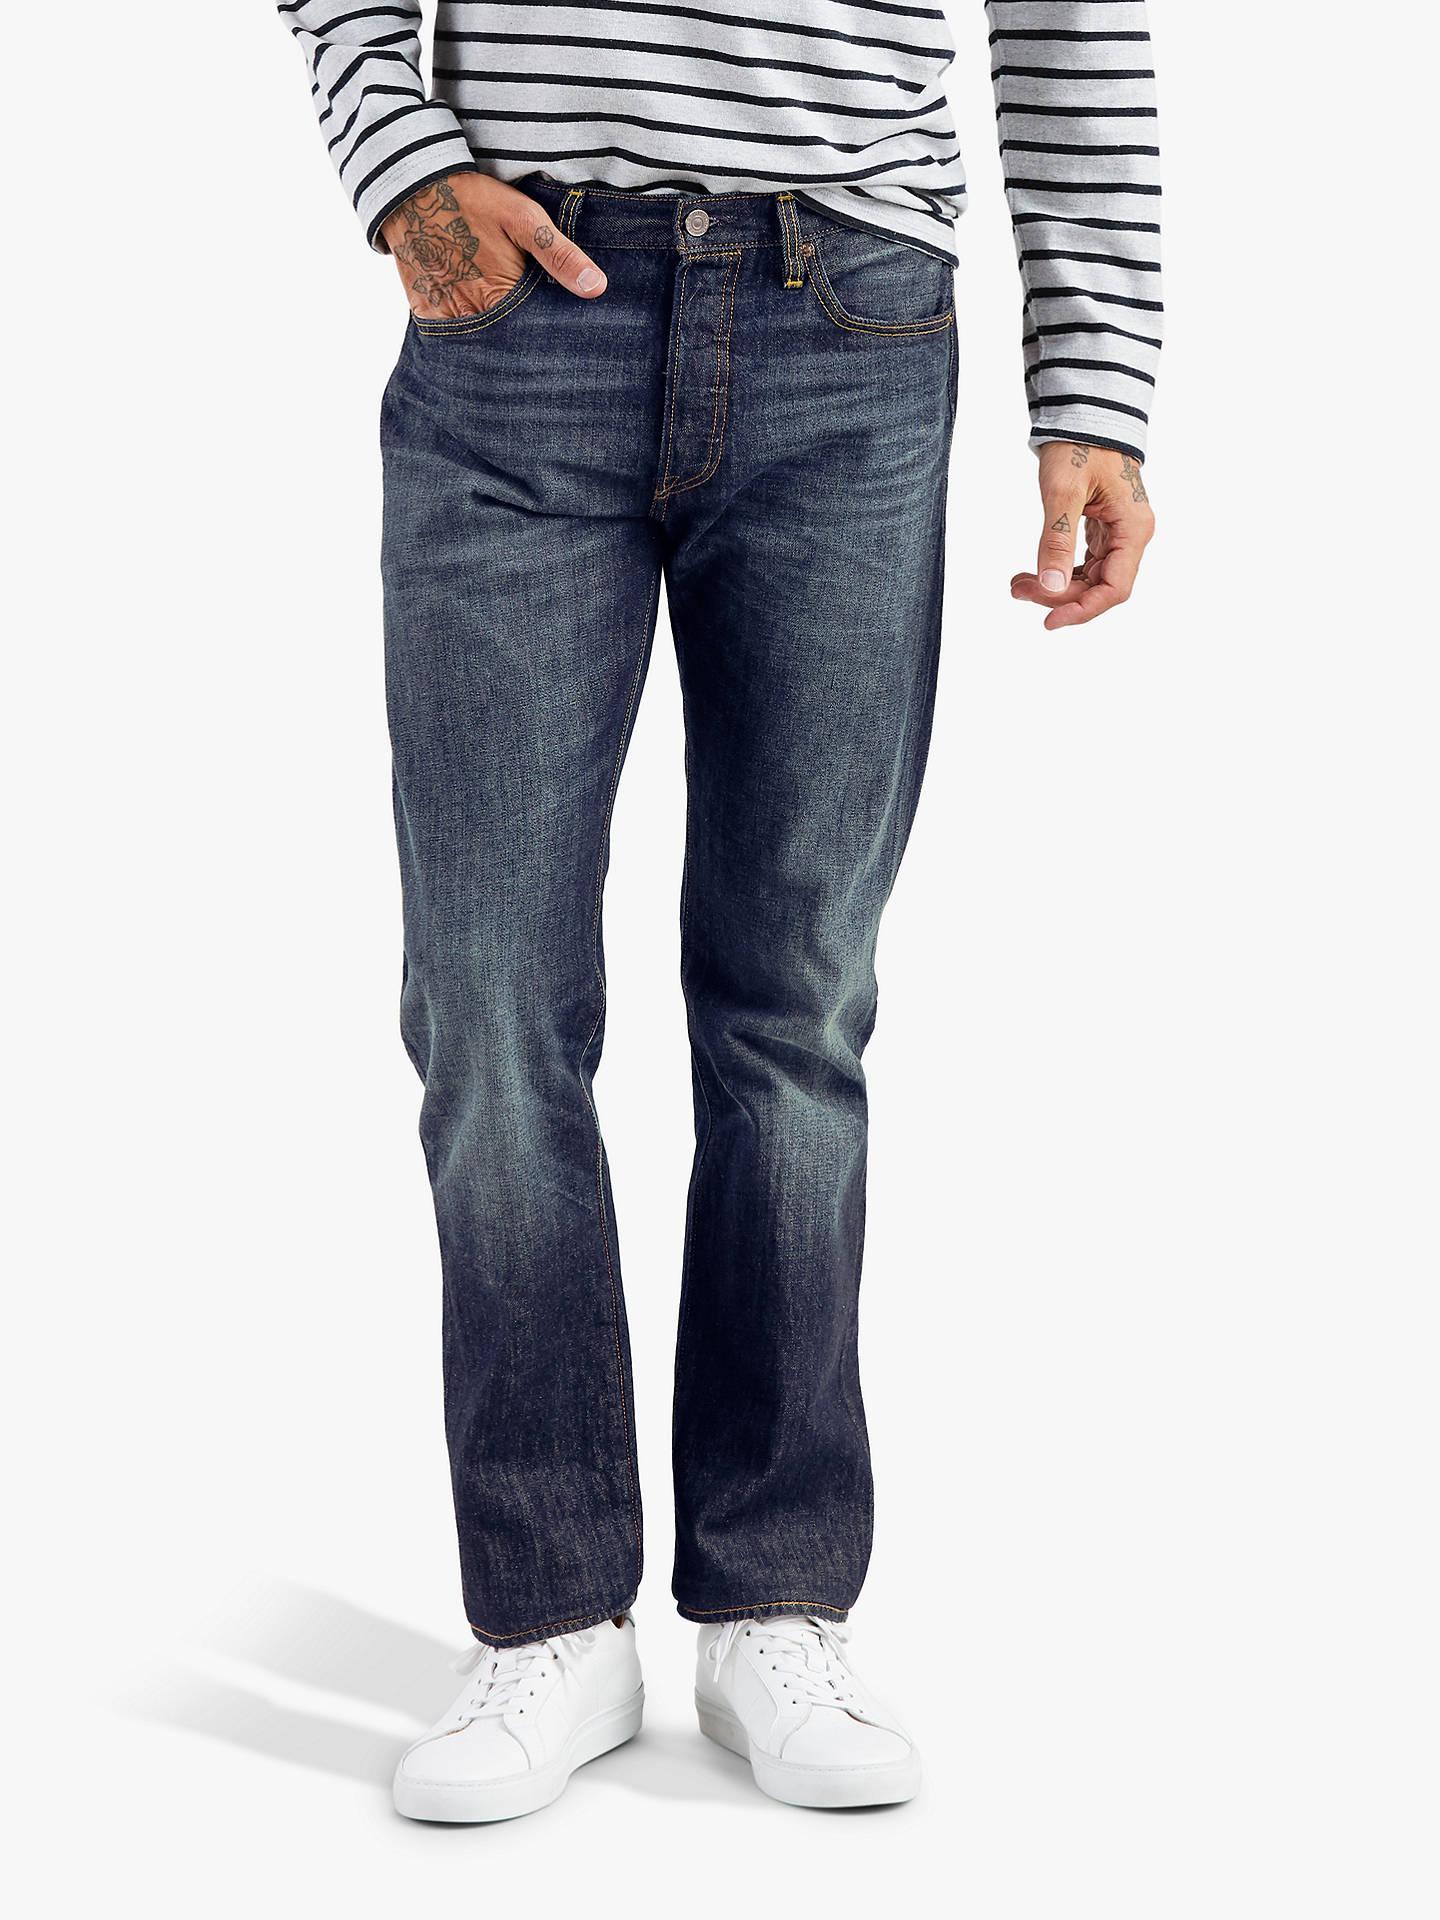 19332f4644b Buy Levi's 501 Original Fit Slim Jeans, Cheviot, 32R Online at johnlewis.  ...